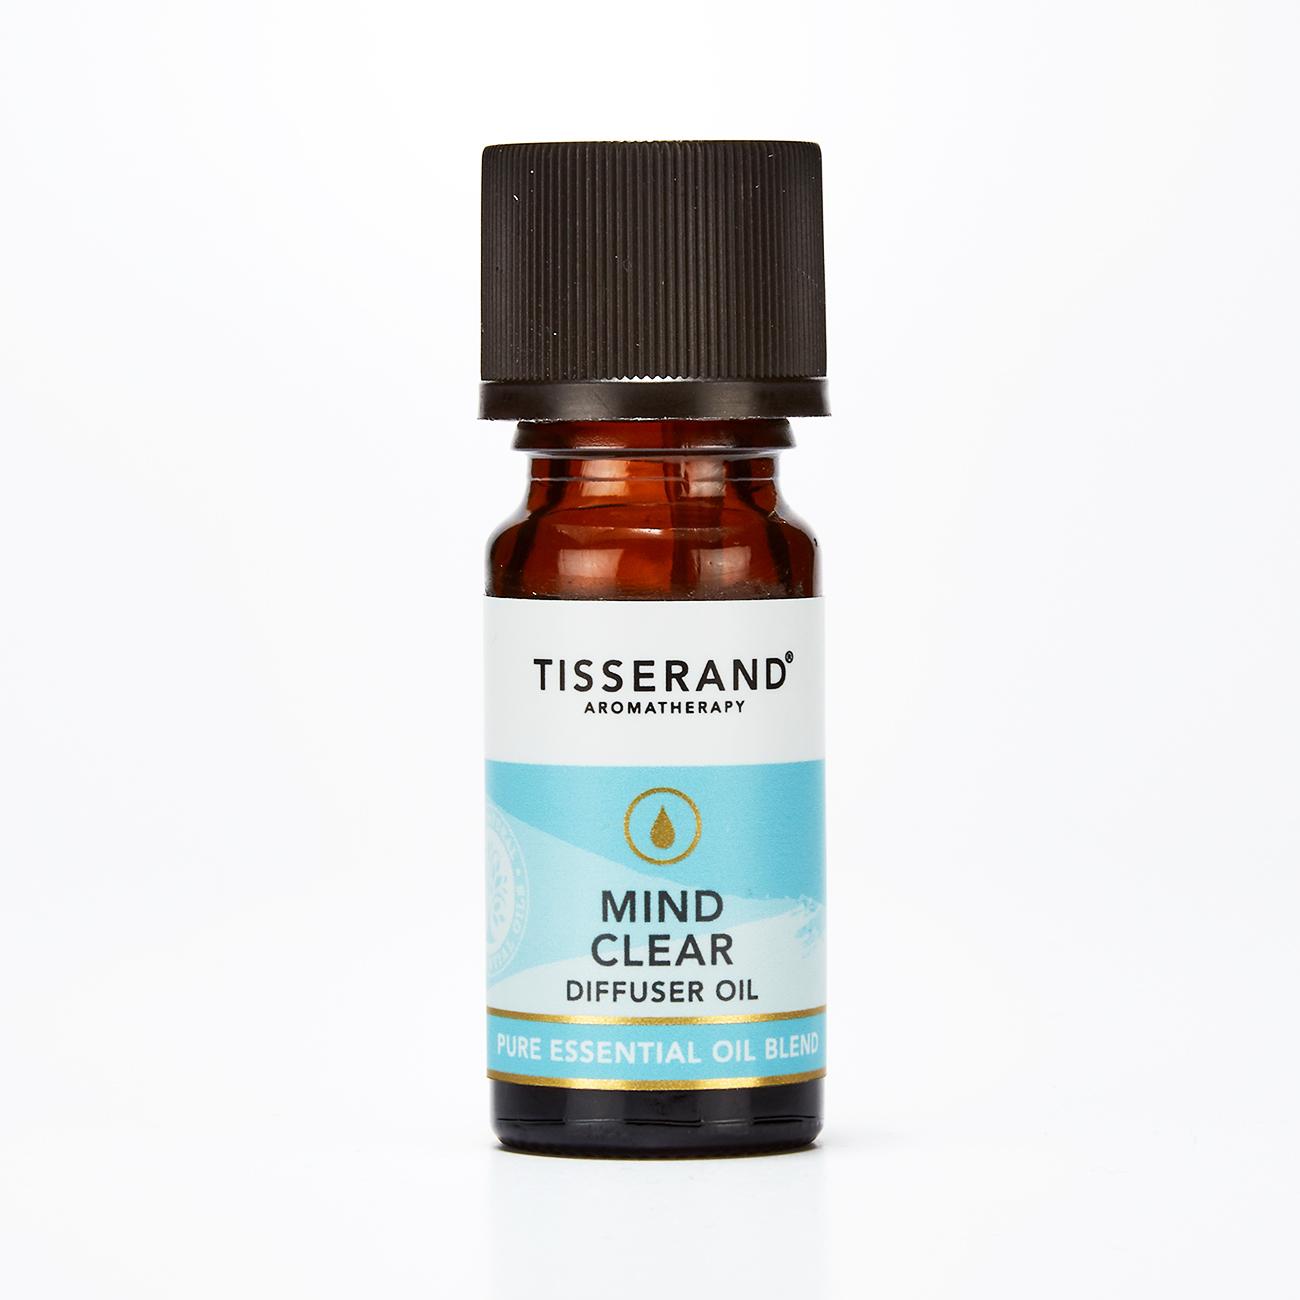 Mind Clear Diffuser Oil 9ml